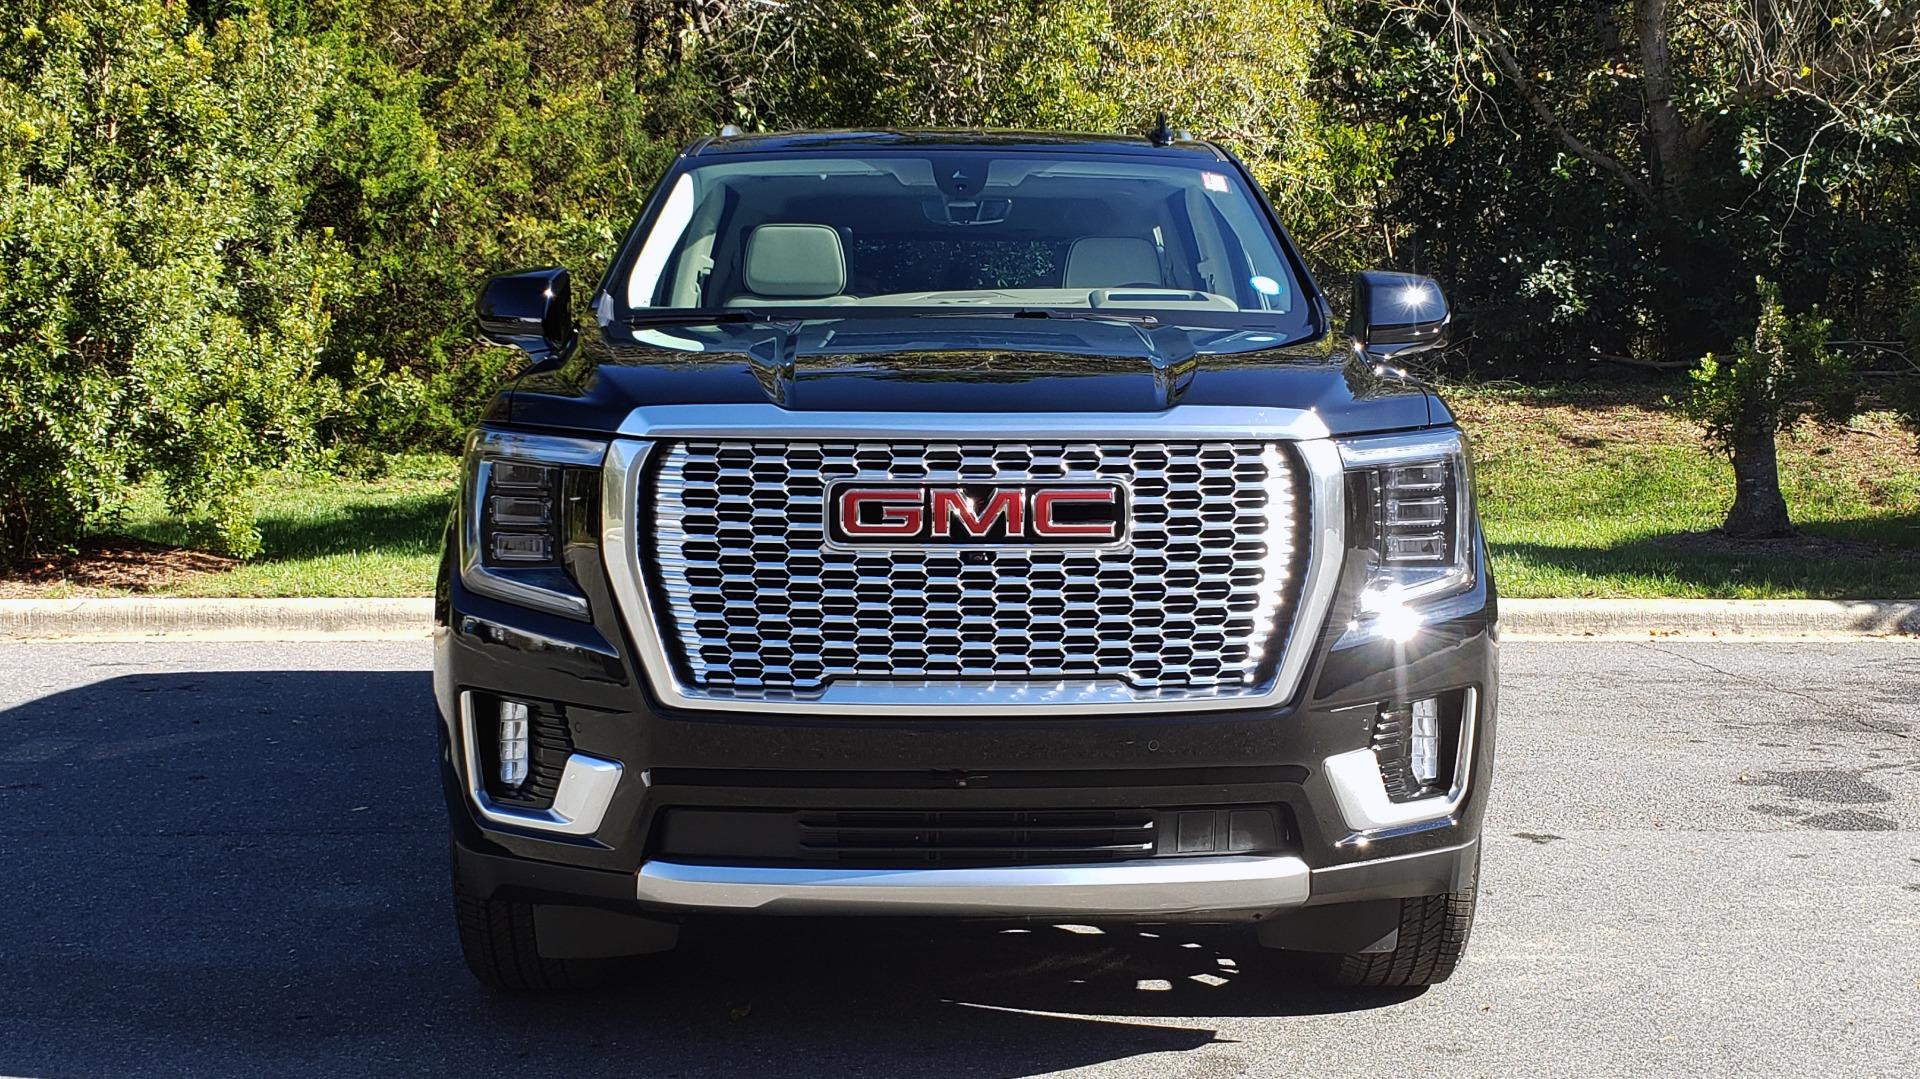 Used 2021 GMC YUKON DENALI PREMIUM 4WD / NAV / ADVANCED TECH / ENTERTAINMENT for sale Sold at Formula Imports in Charlotte NC 28227 22